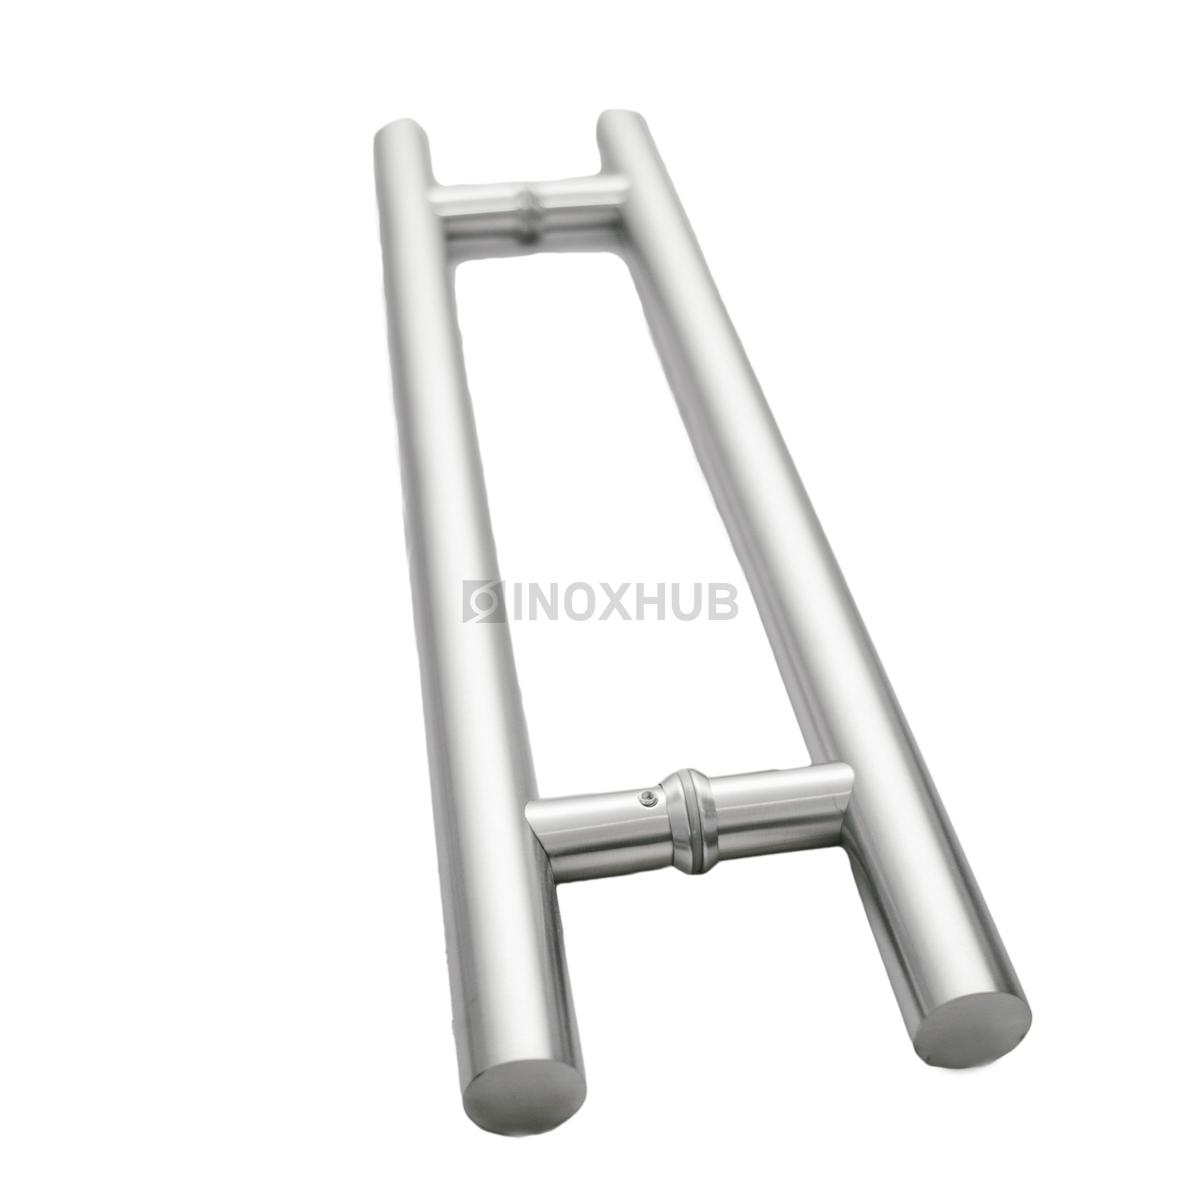 Ручка двусторонняя для стеклянных дверей, 633-600 SSS